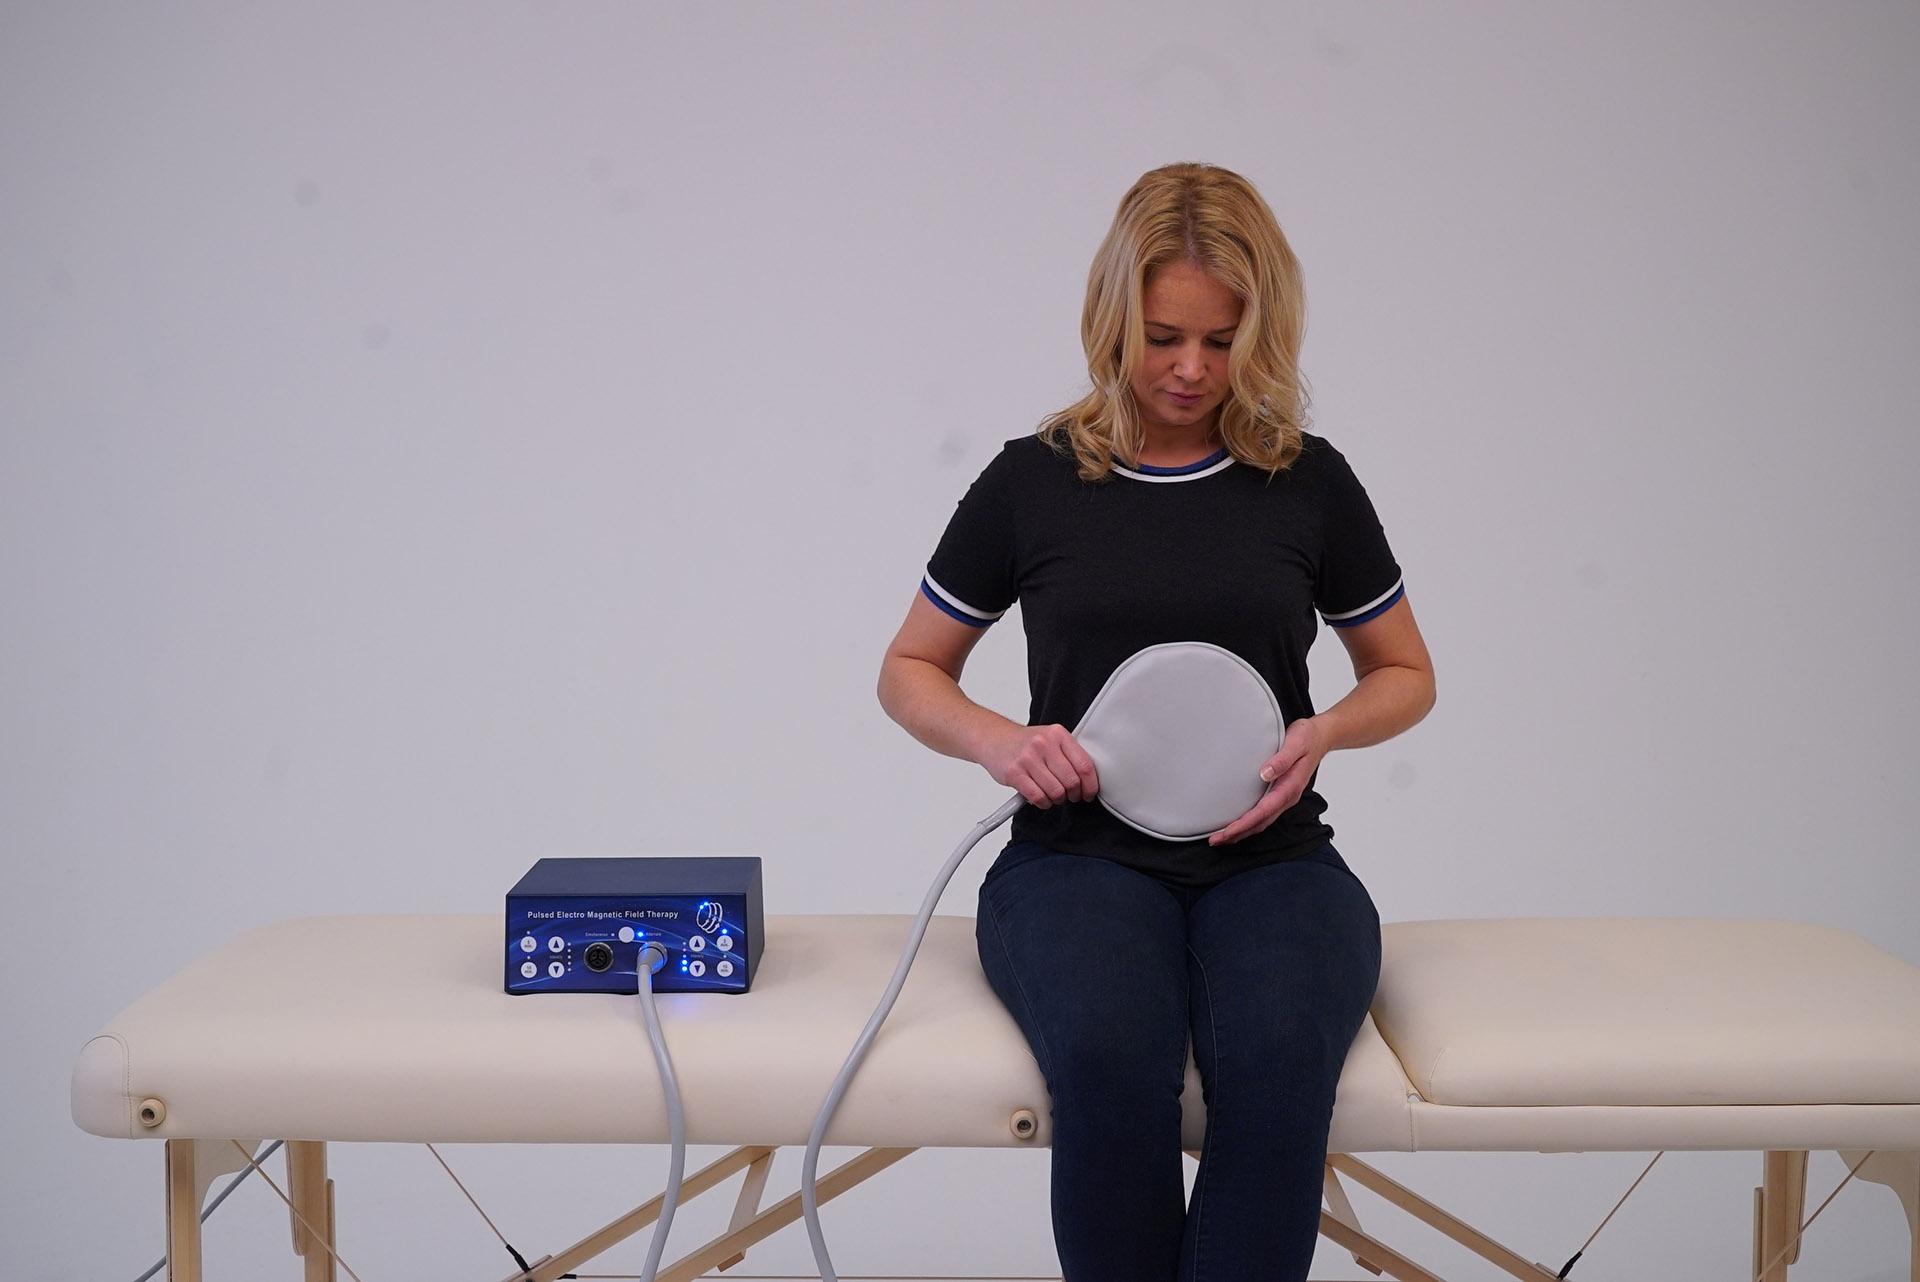 PEMF therapy clinic machine TeslaFit Duo stomach